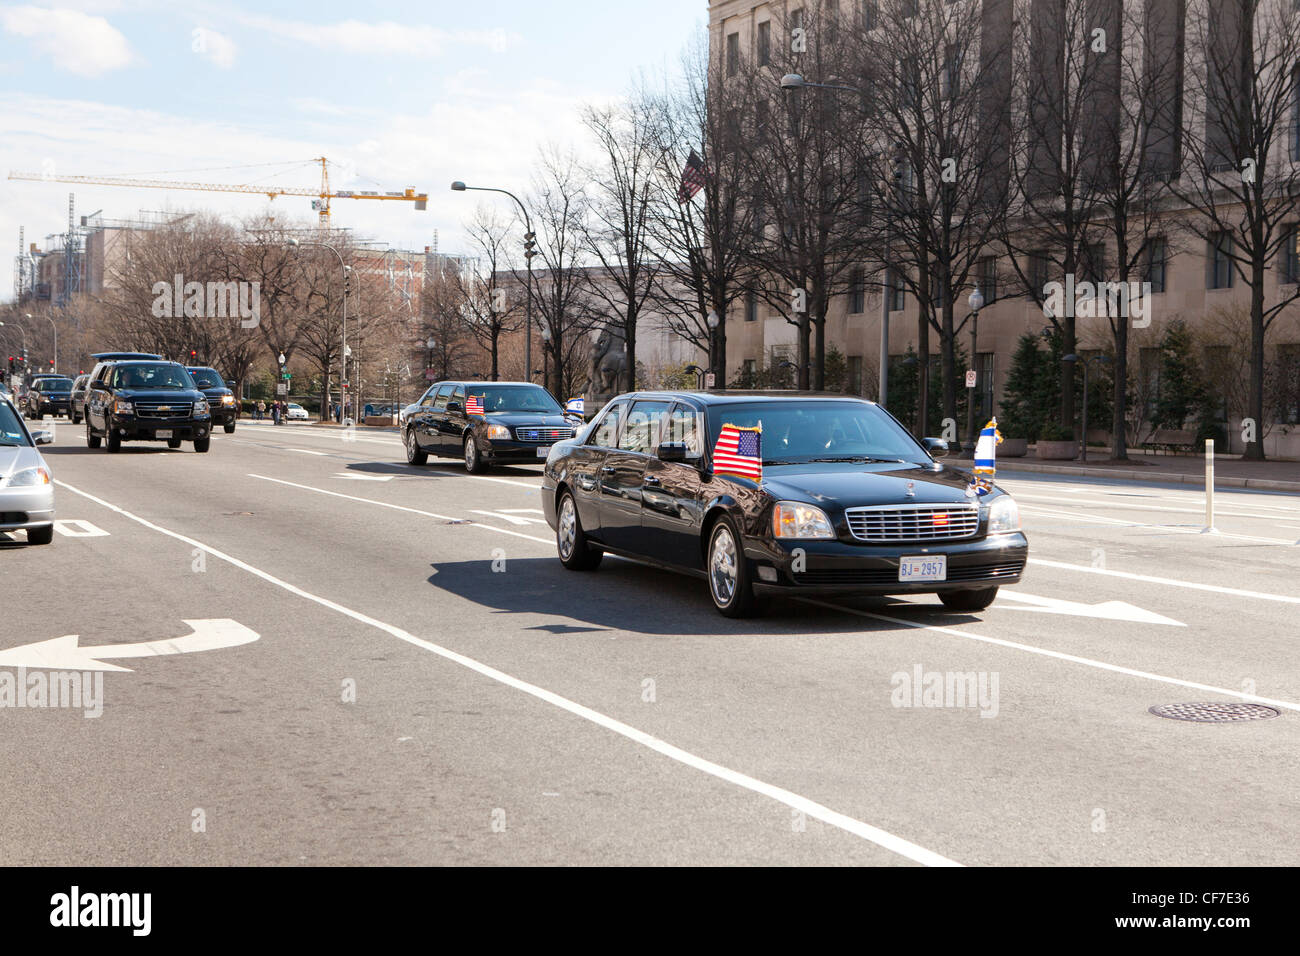 Israeli government delegation limousine driving through Pennsylvania Avenue - Washington, DC USA - Stock Image